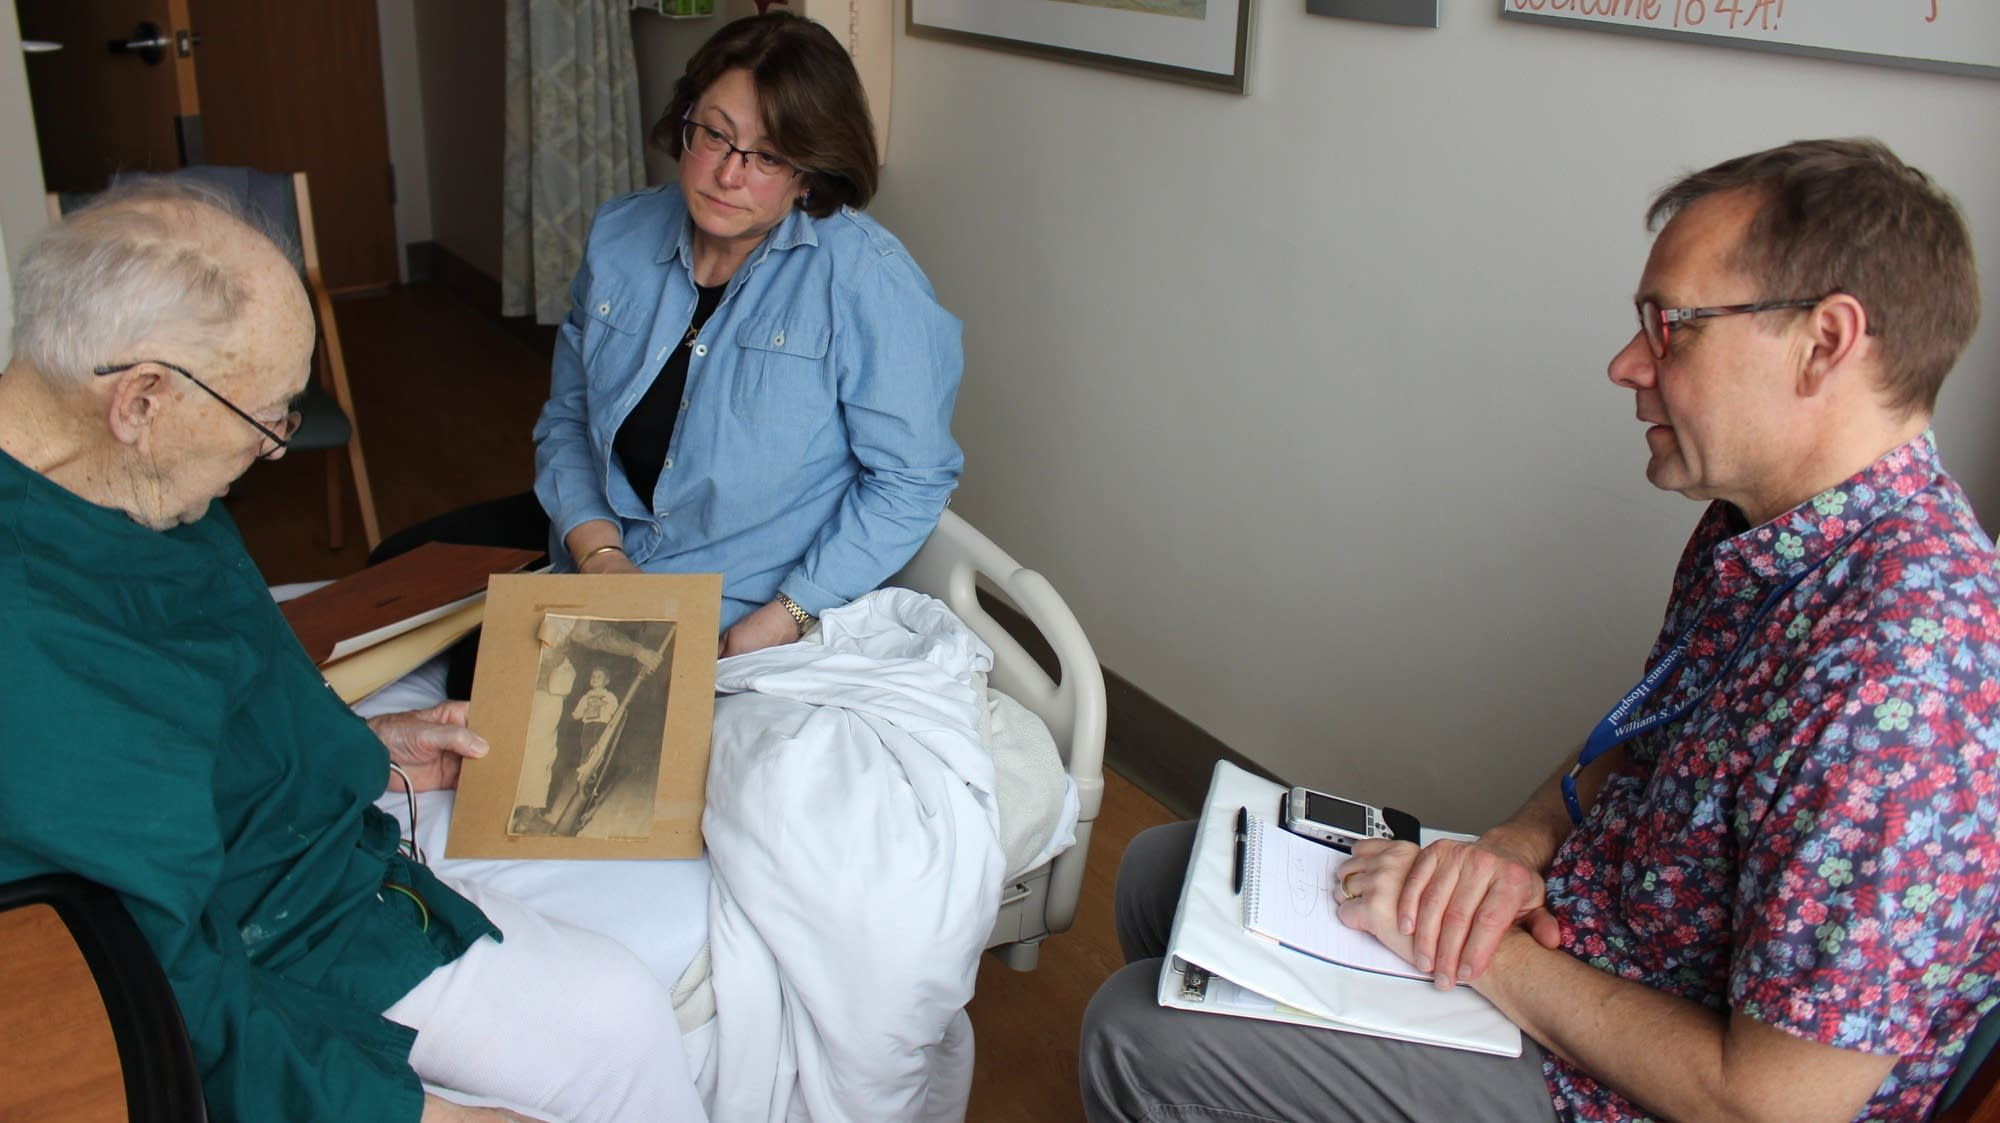 Thor Ringler (right) interviewed Ray Miller innMiller's hospital room